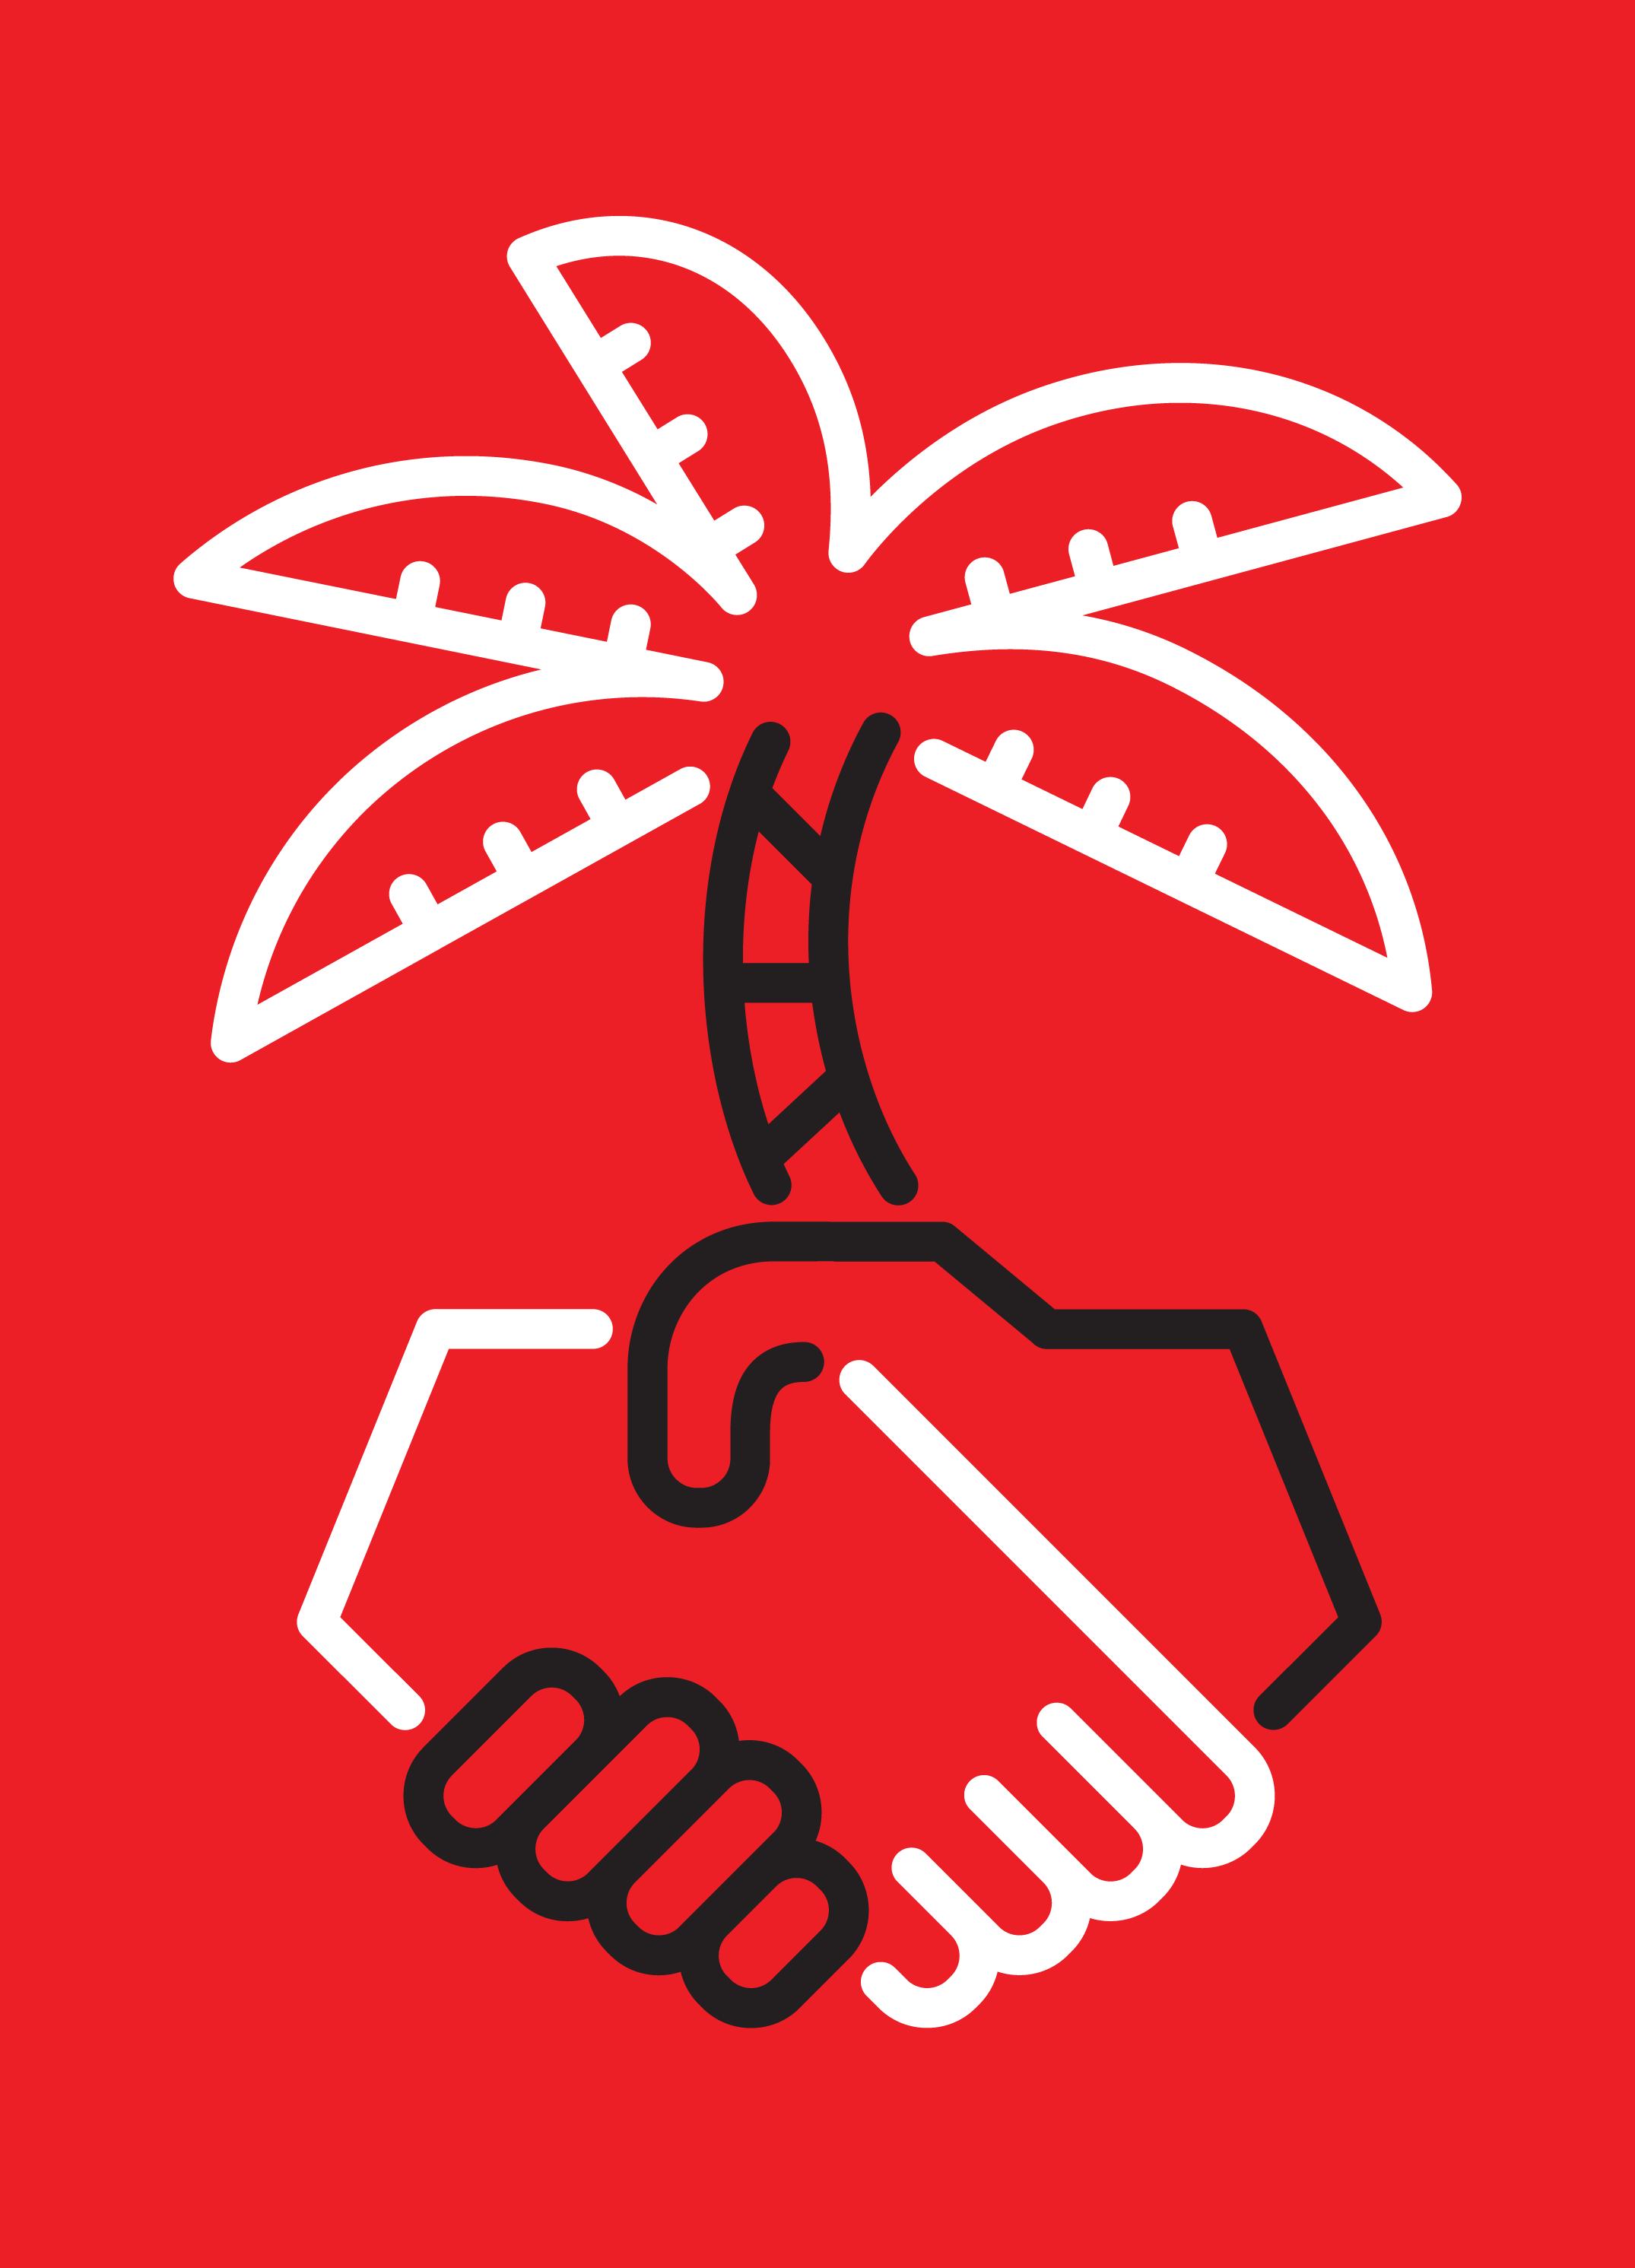 Site icon for Democratic Socialists of America Los Angeles (DSA-LA)